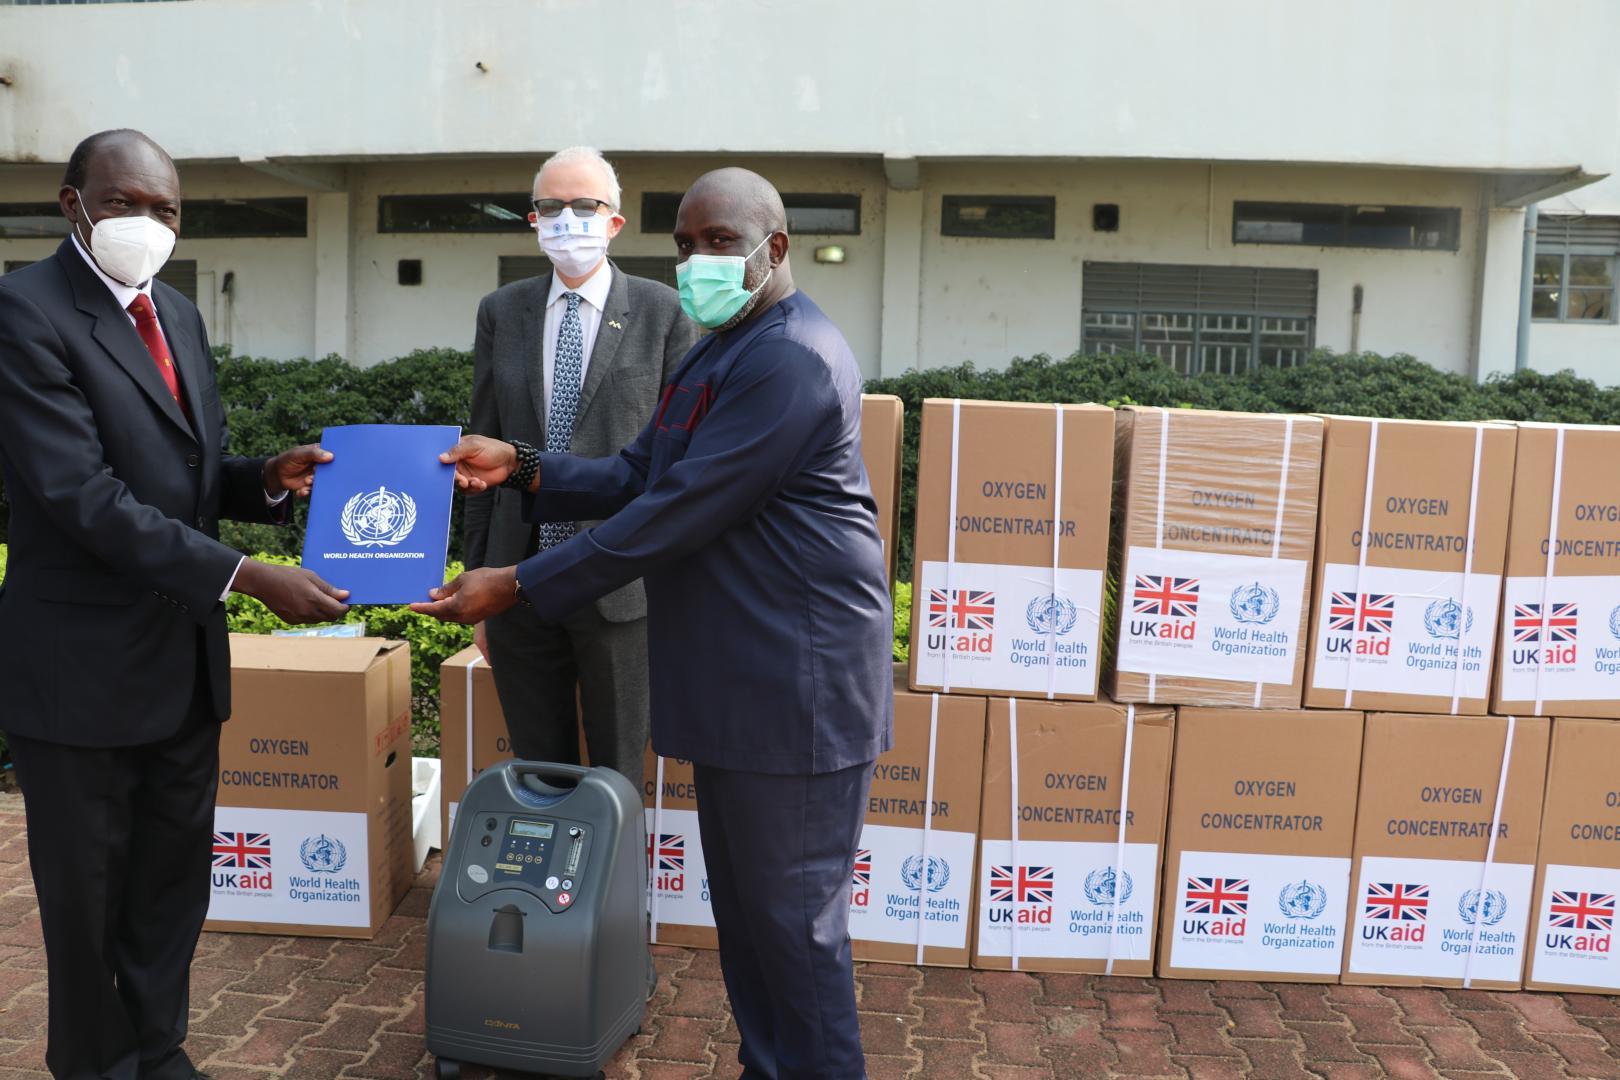 Dr Olushayo Olu, WHO Representative handing over the donation certificate to Dr Mayen Machut Achiek, Undersecretary, Ministry of Health in the presence of Chris Trott, British Ambassador